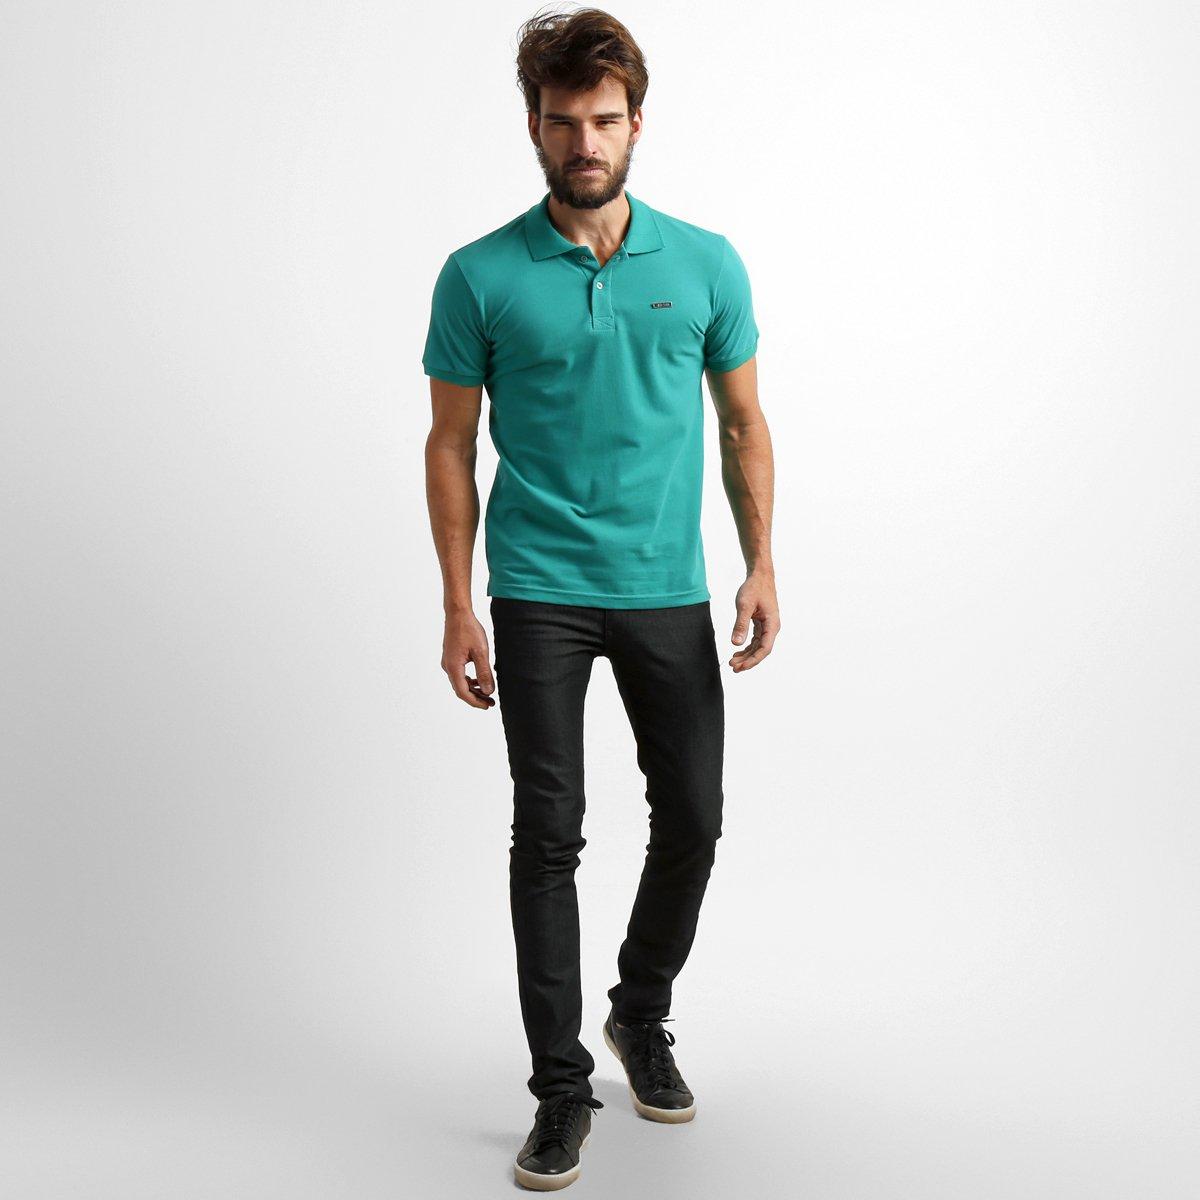 Camisa Polo RG 518 Piquet Básica - Compre Agora  936768b62dc3b